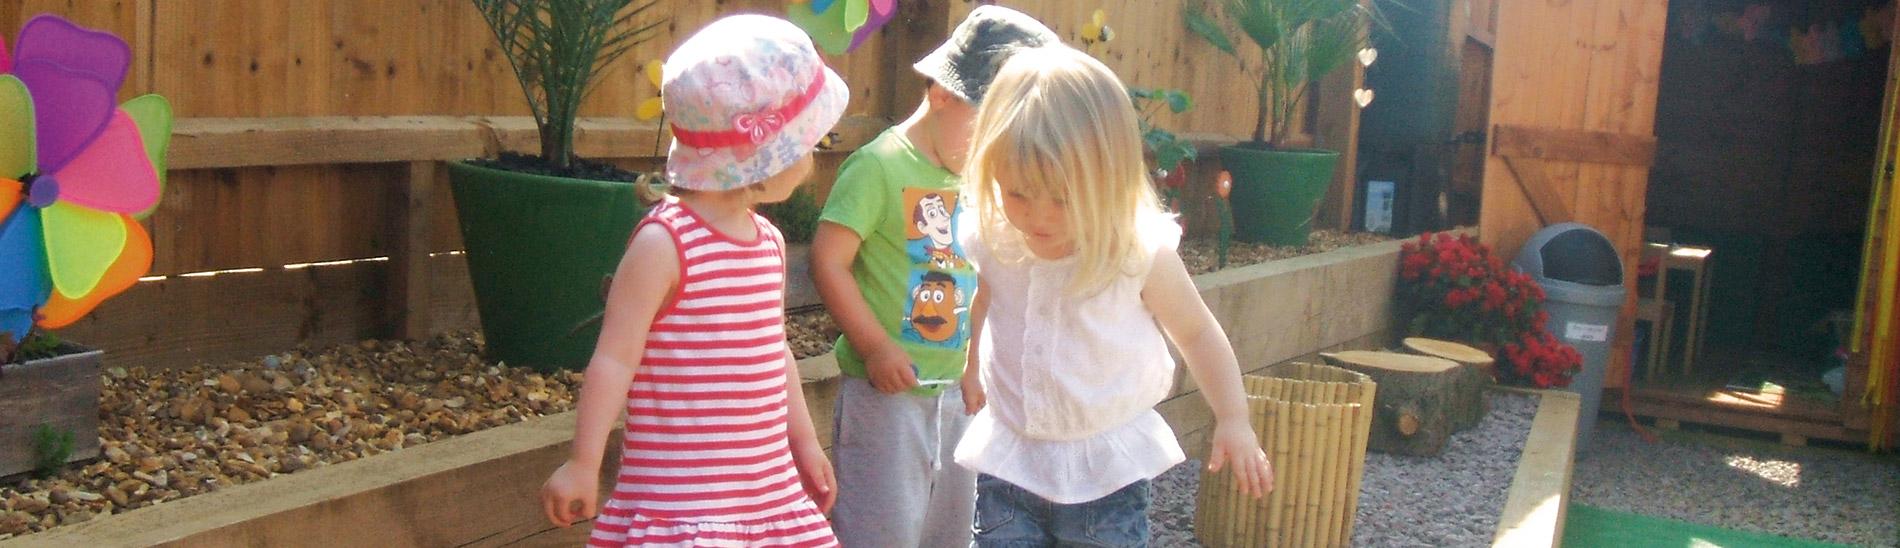 Daycare garden play